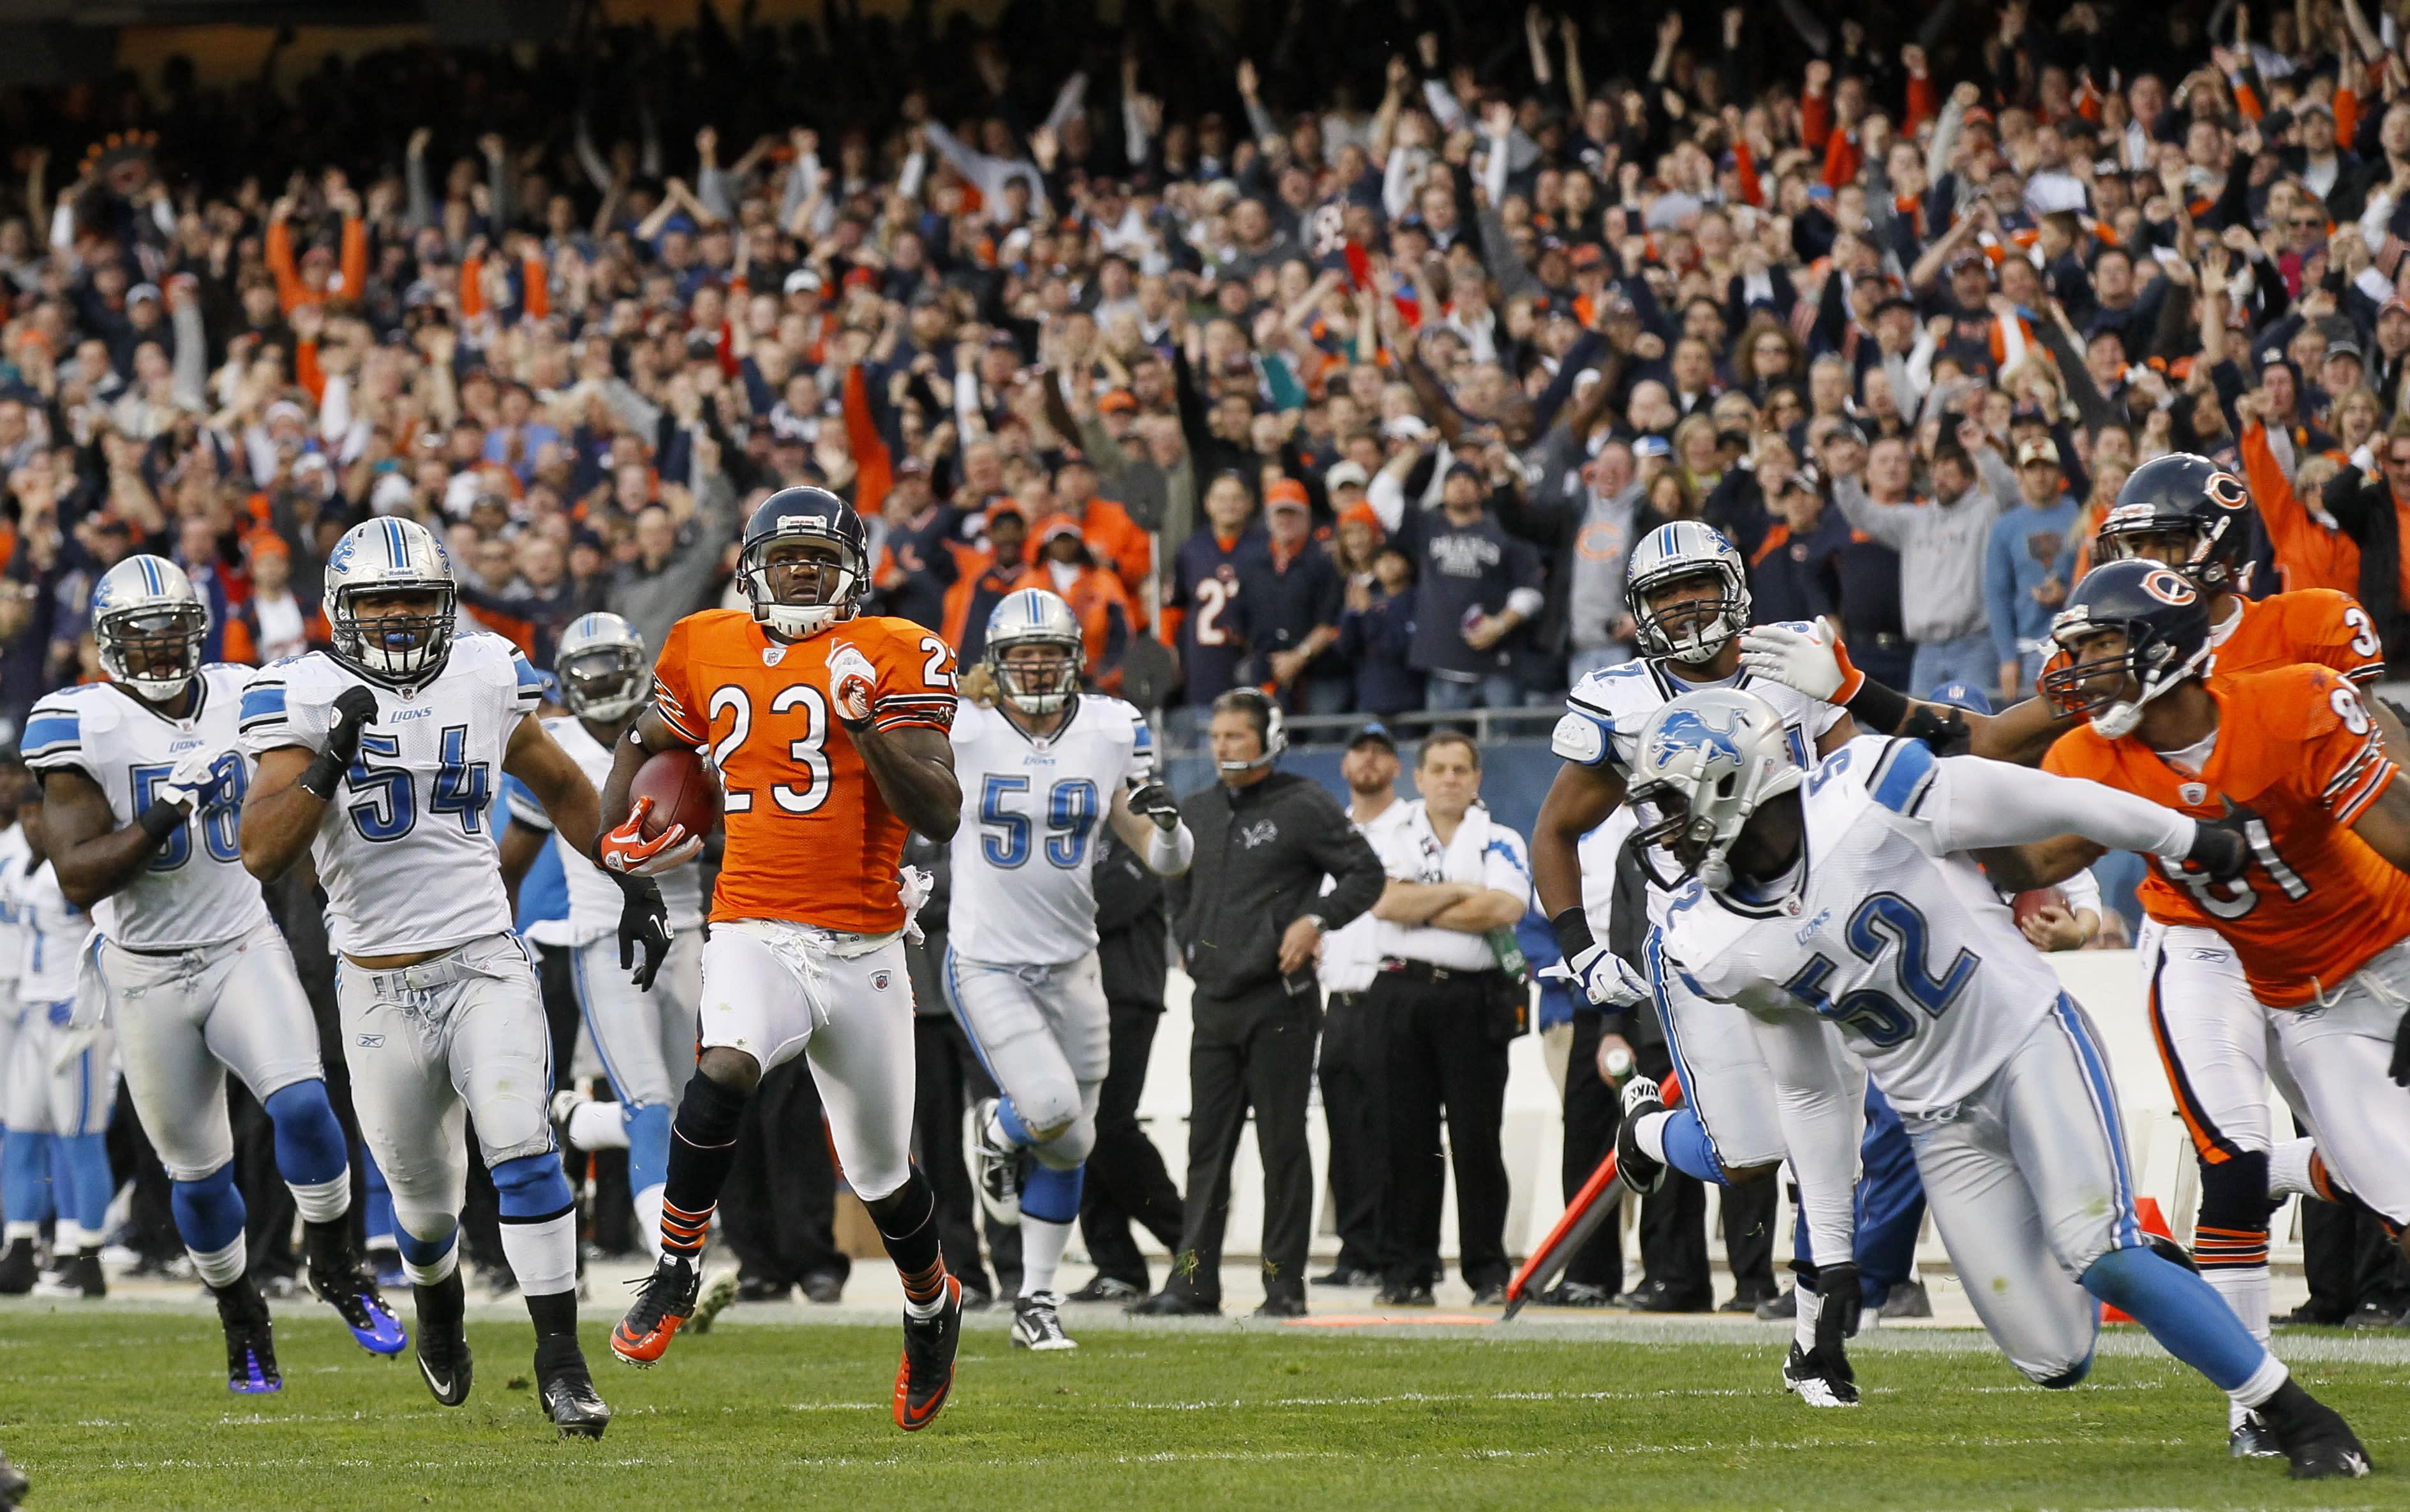 Devin Hester, the NFL's greatest return man, announces his retirement